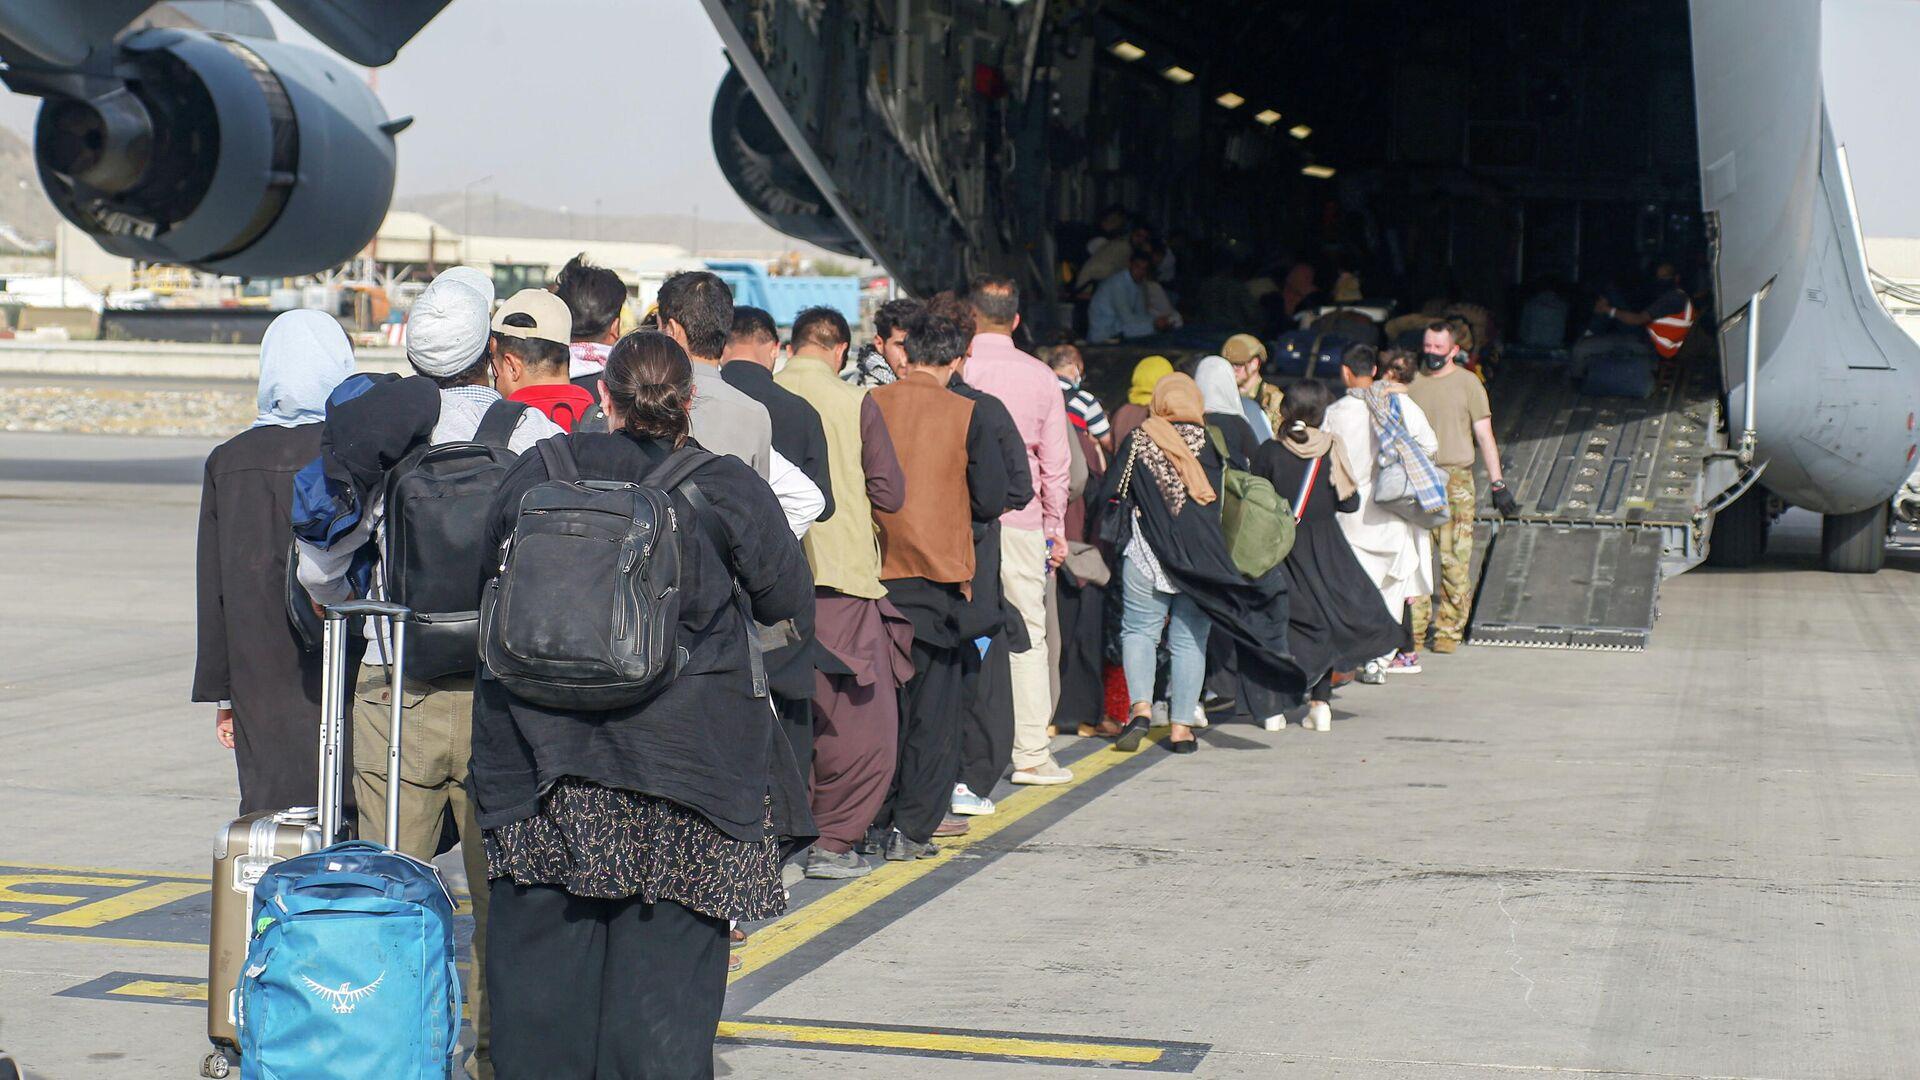 Беженцы в аэропорту Кабула - Sputnik Ўзбекистон, 1920, 01.09.2021